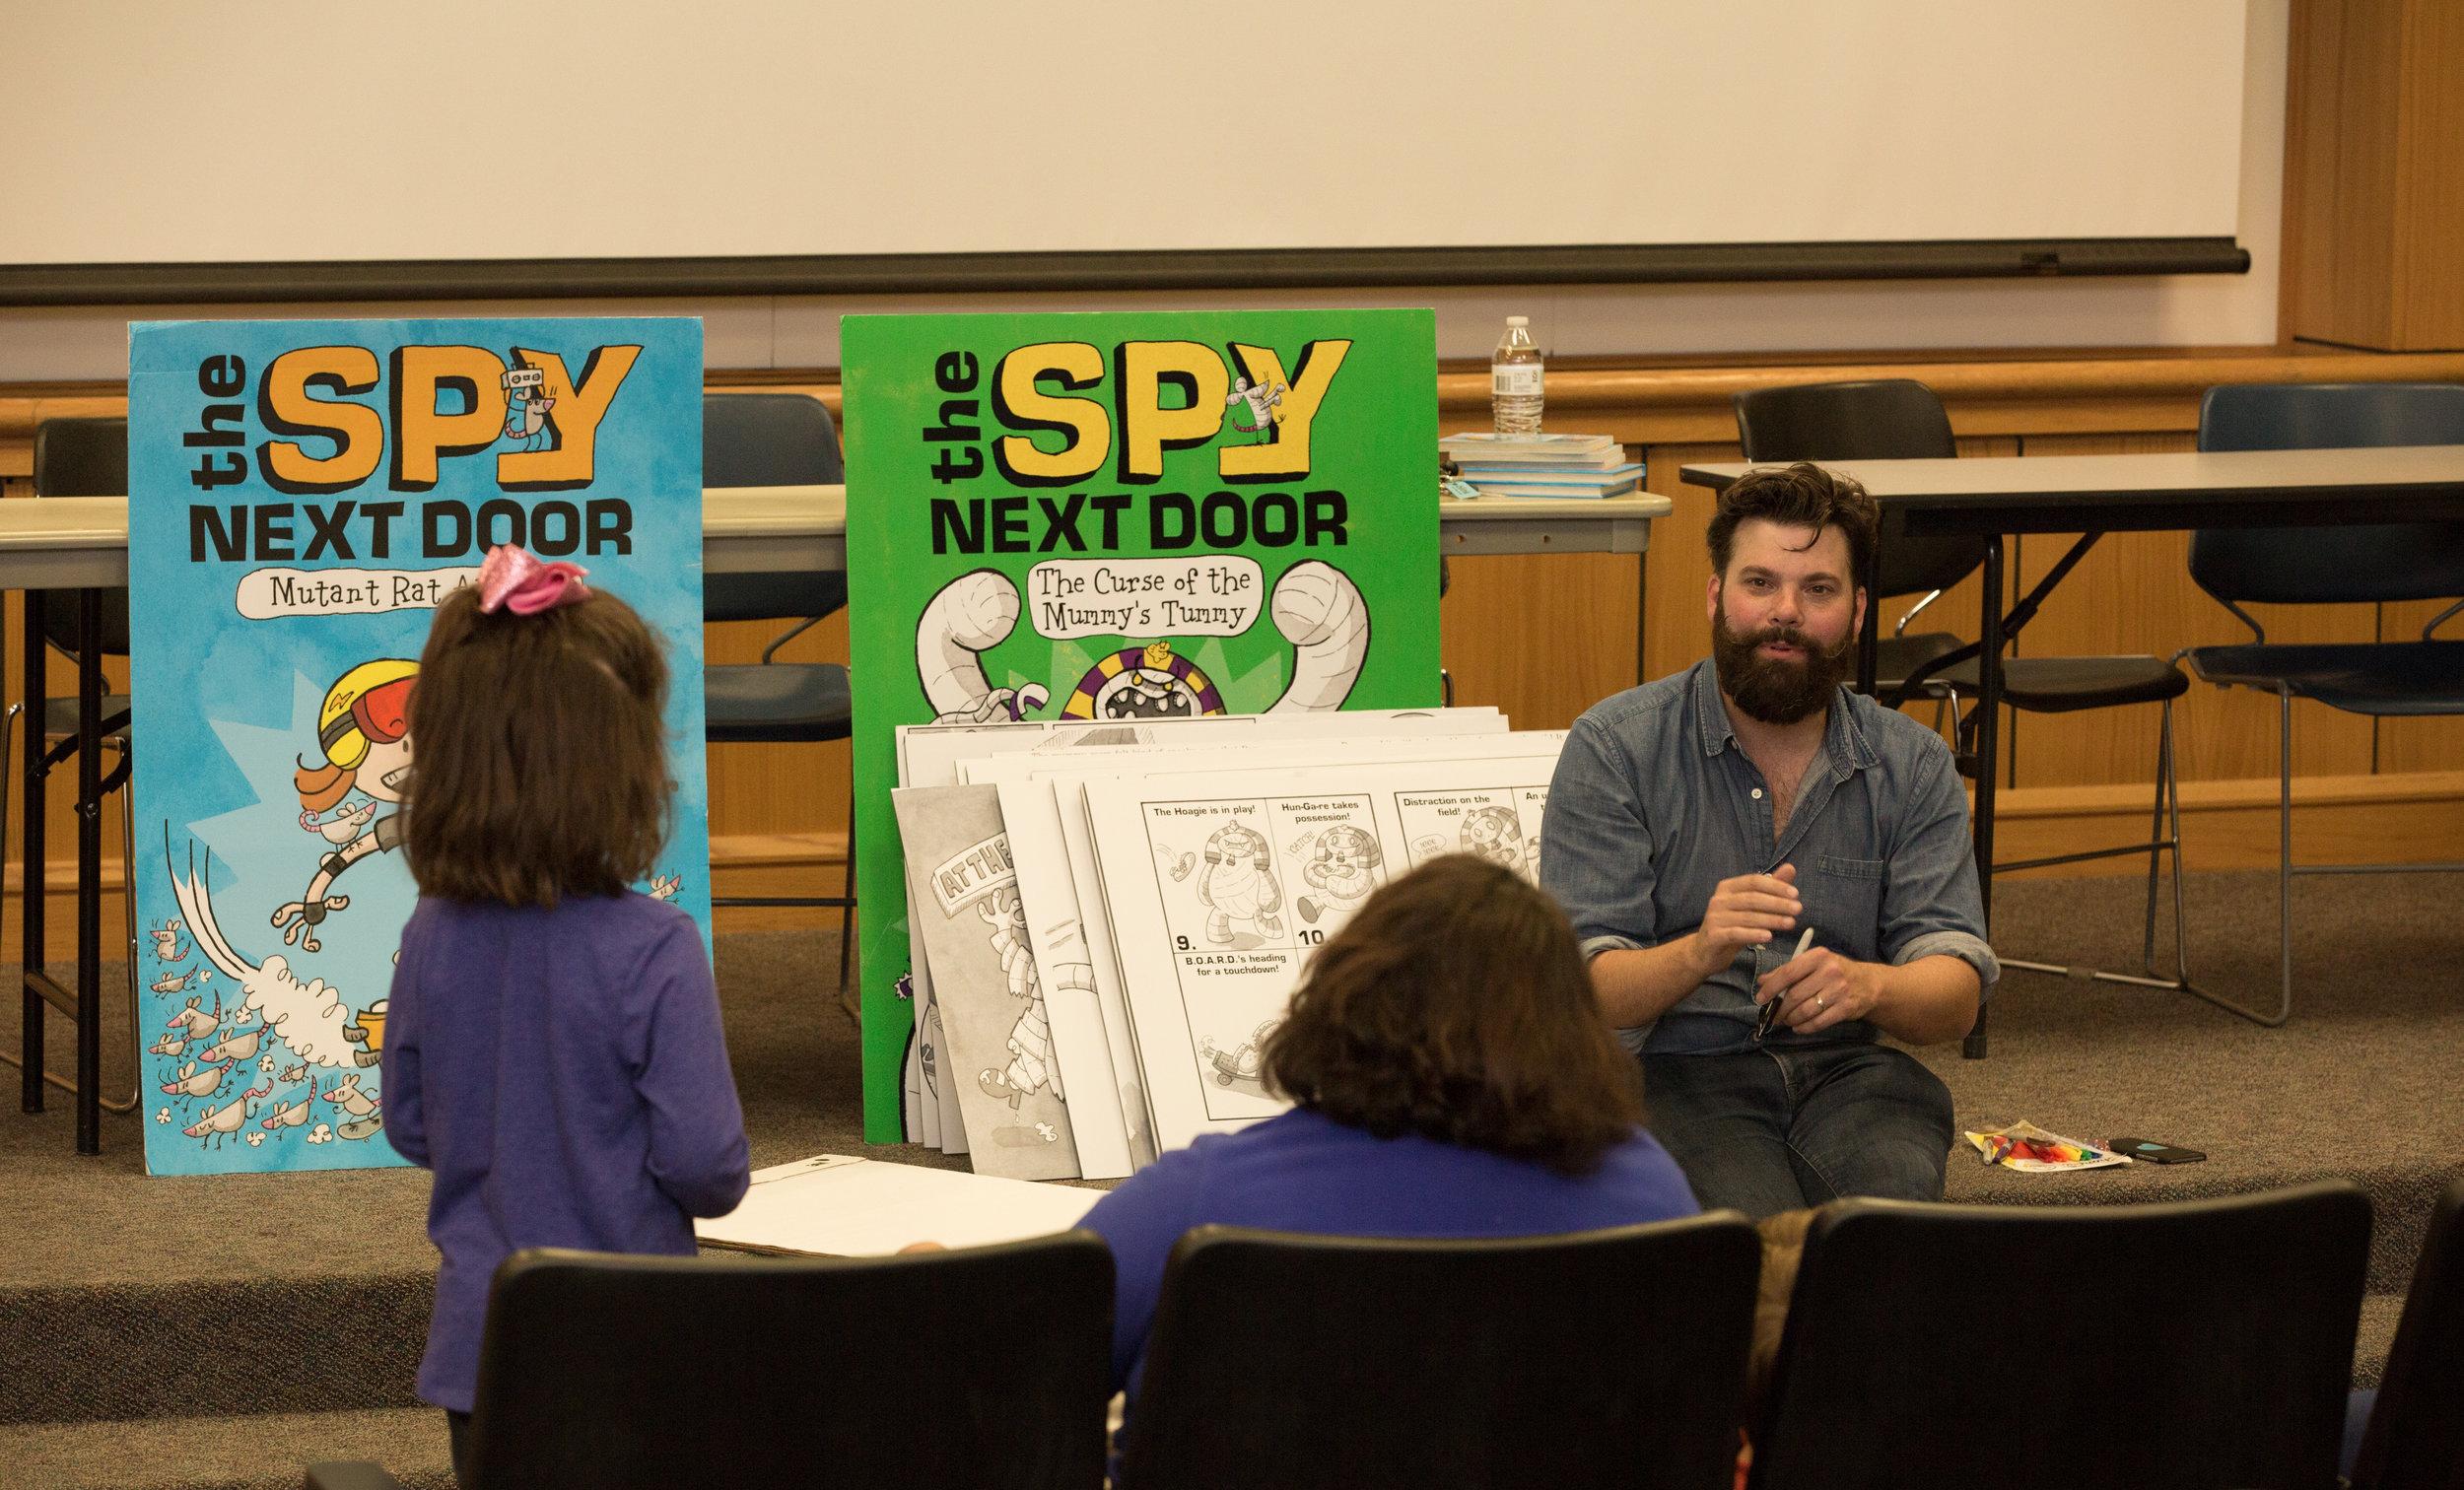 Virginia Children's Book Festival, Farmville, VA • October 2017